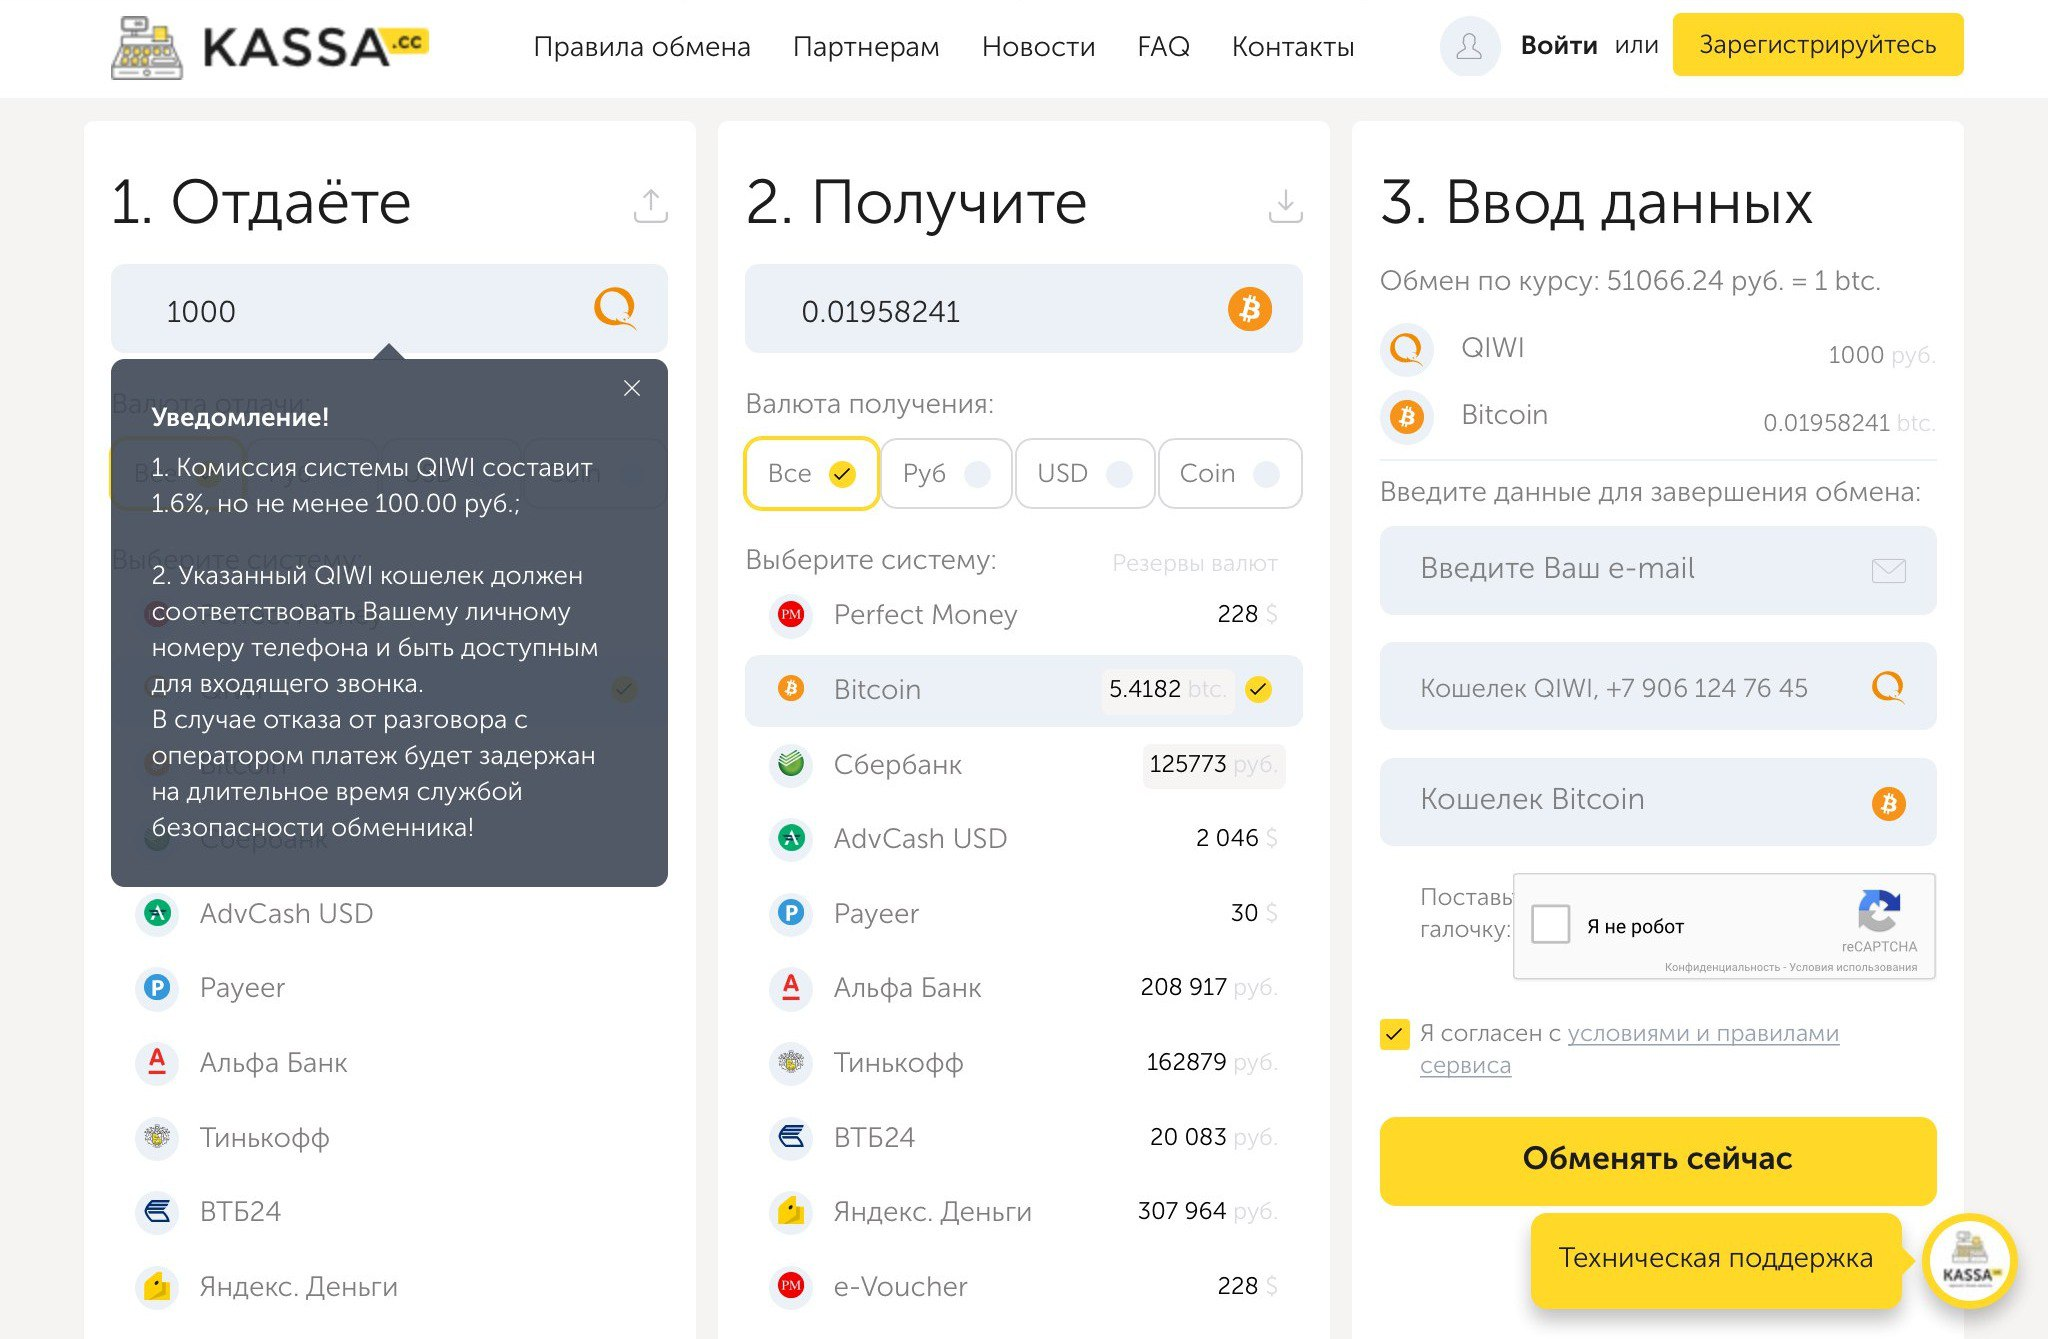 Kassa.cc - единый обмен валюты. Обмен QIWI RUB на Bitcoin